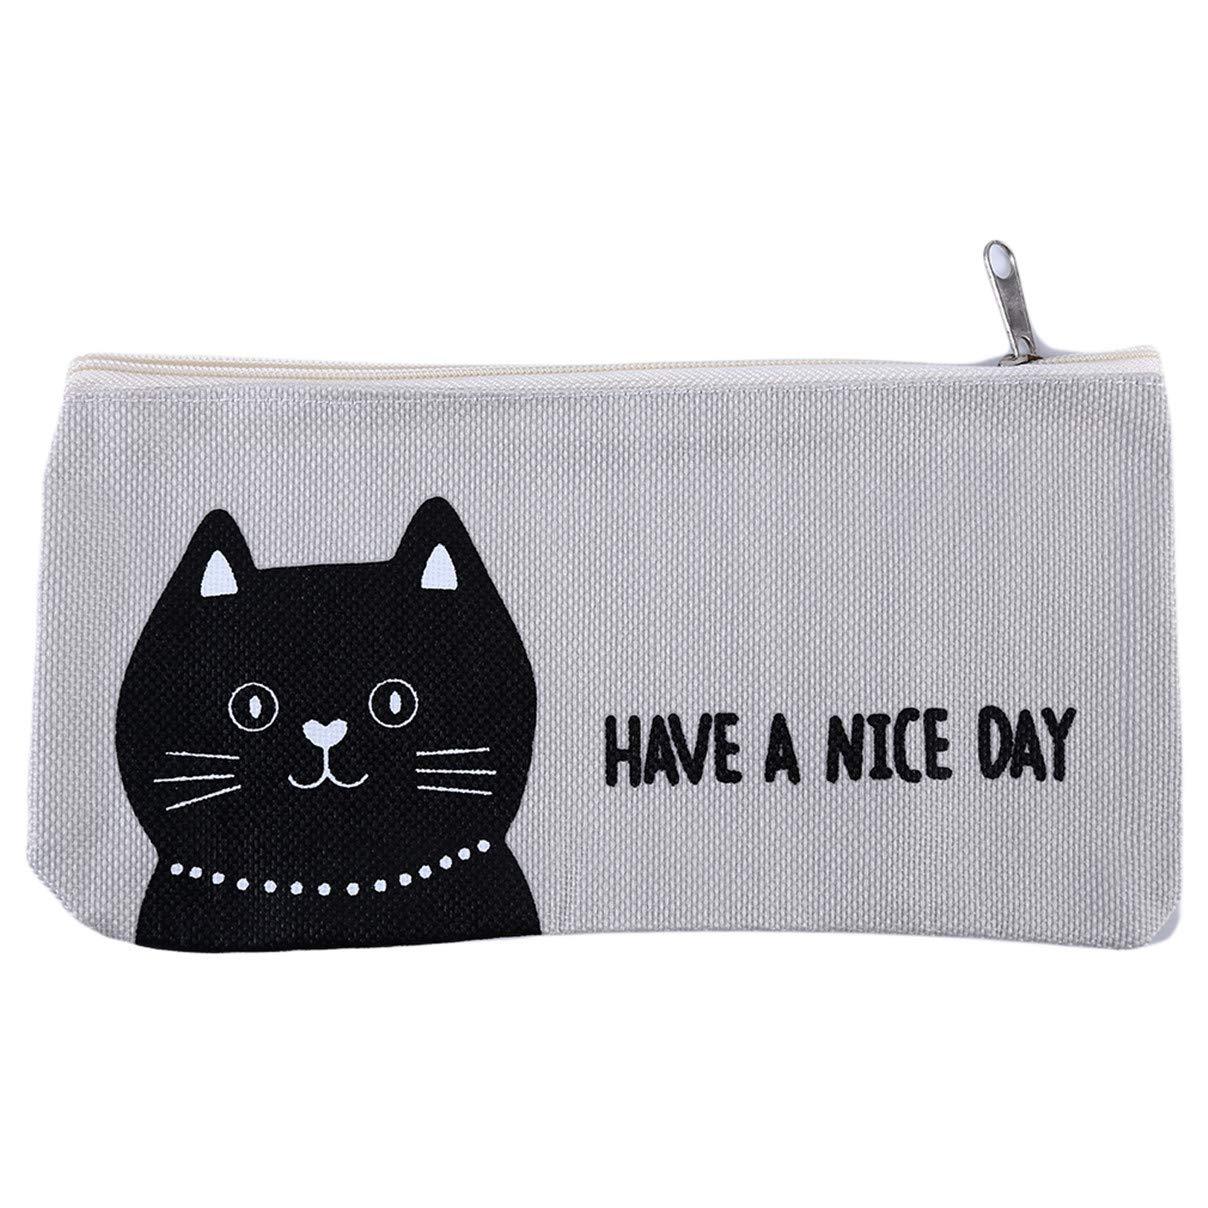 Weiy Pen Bag Pencil Case Cute Cartoon Canvas Pencil Case Or As Cosmetic Bag for Ladies